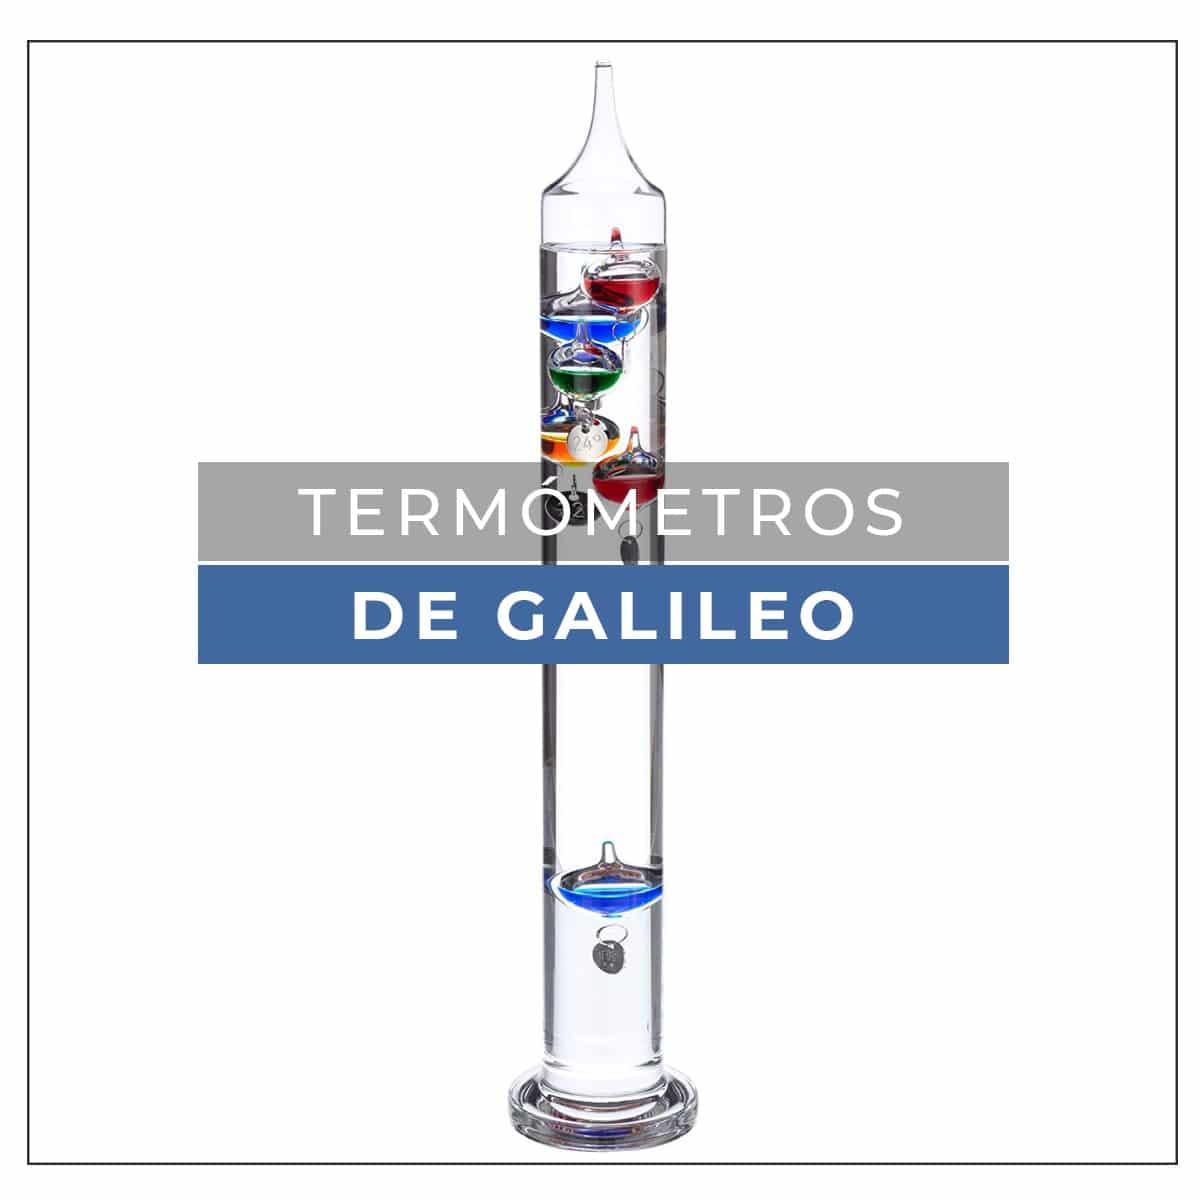 termometro de galileo